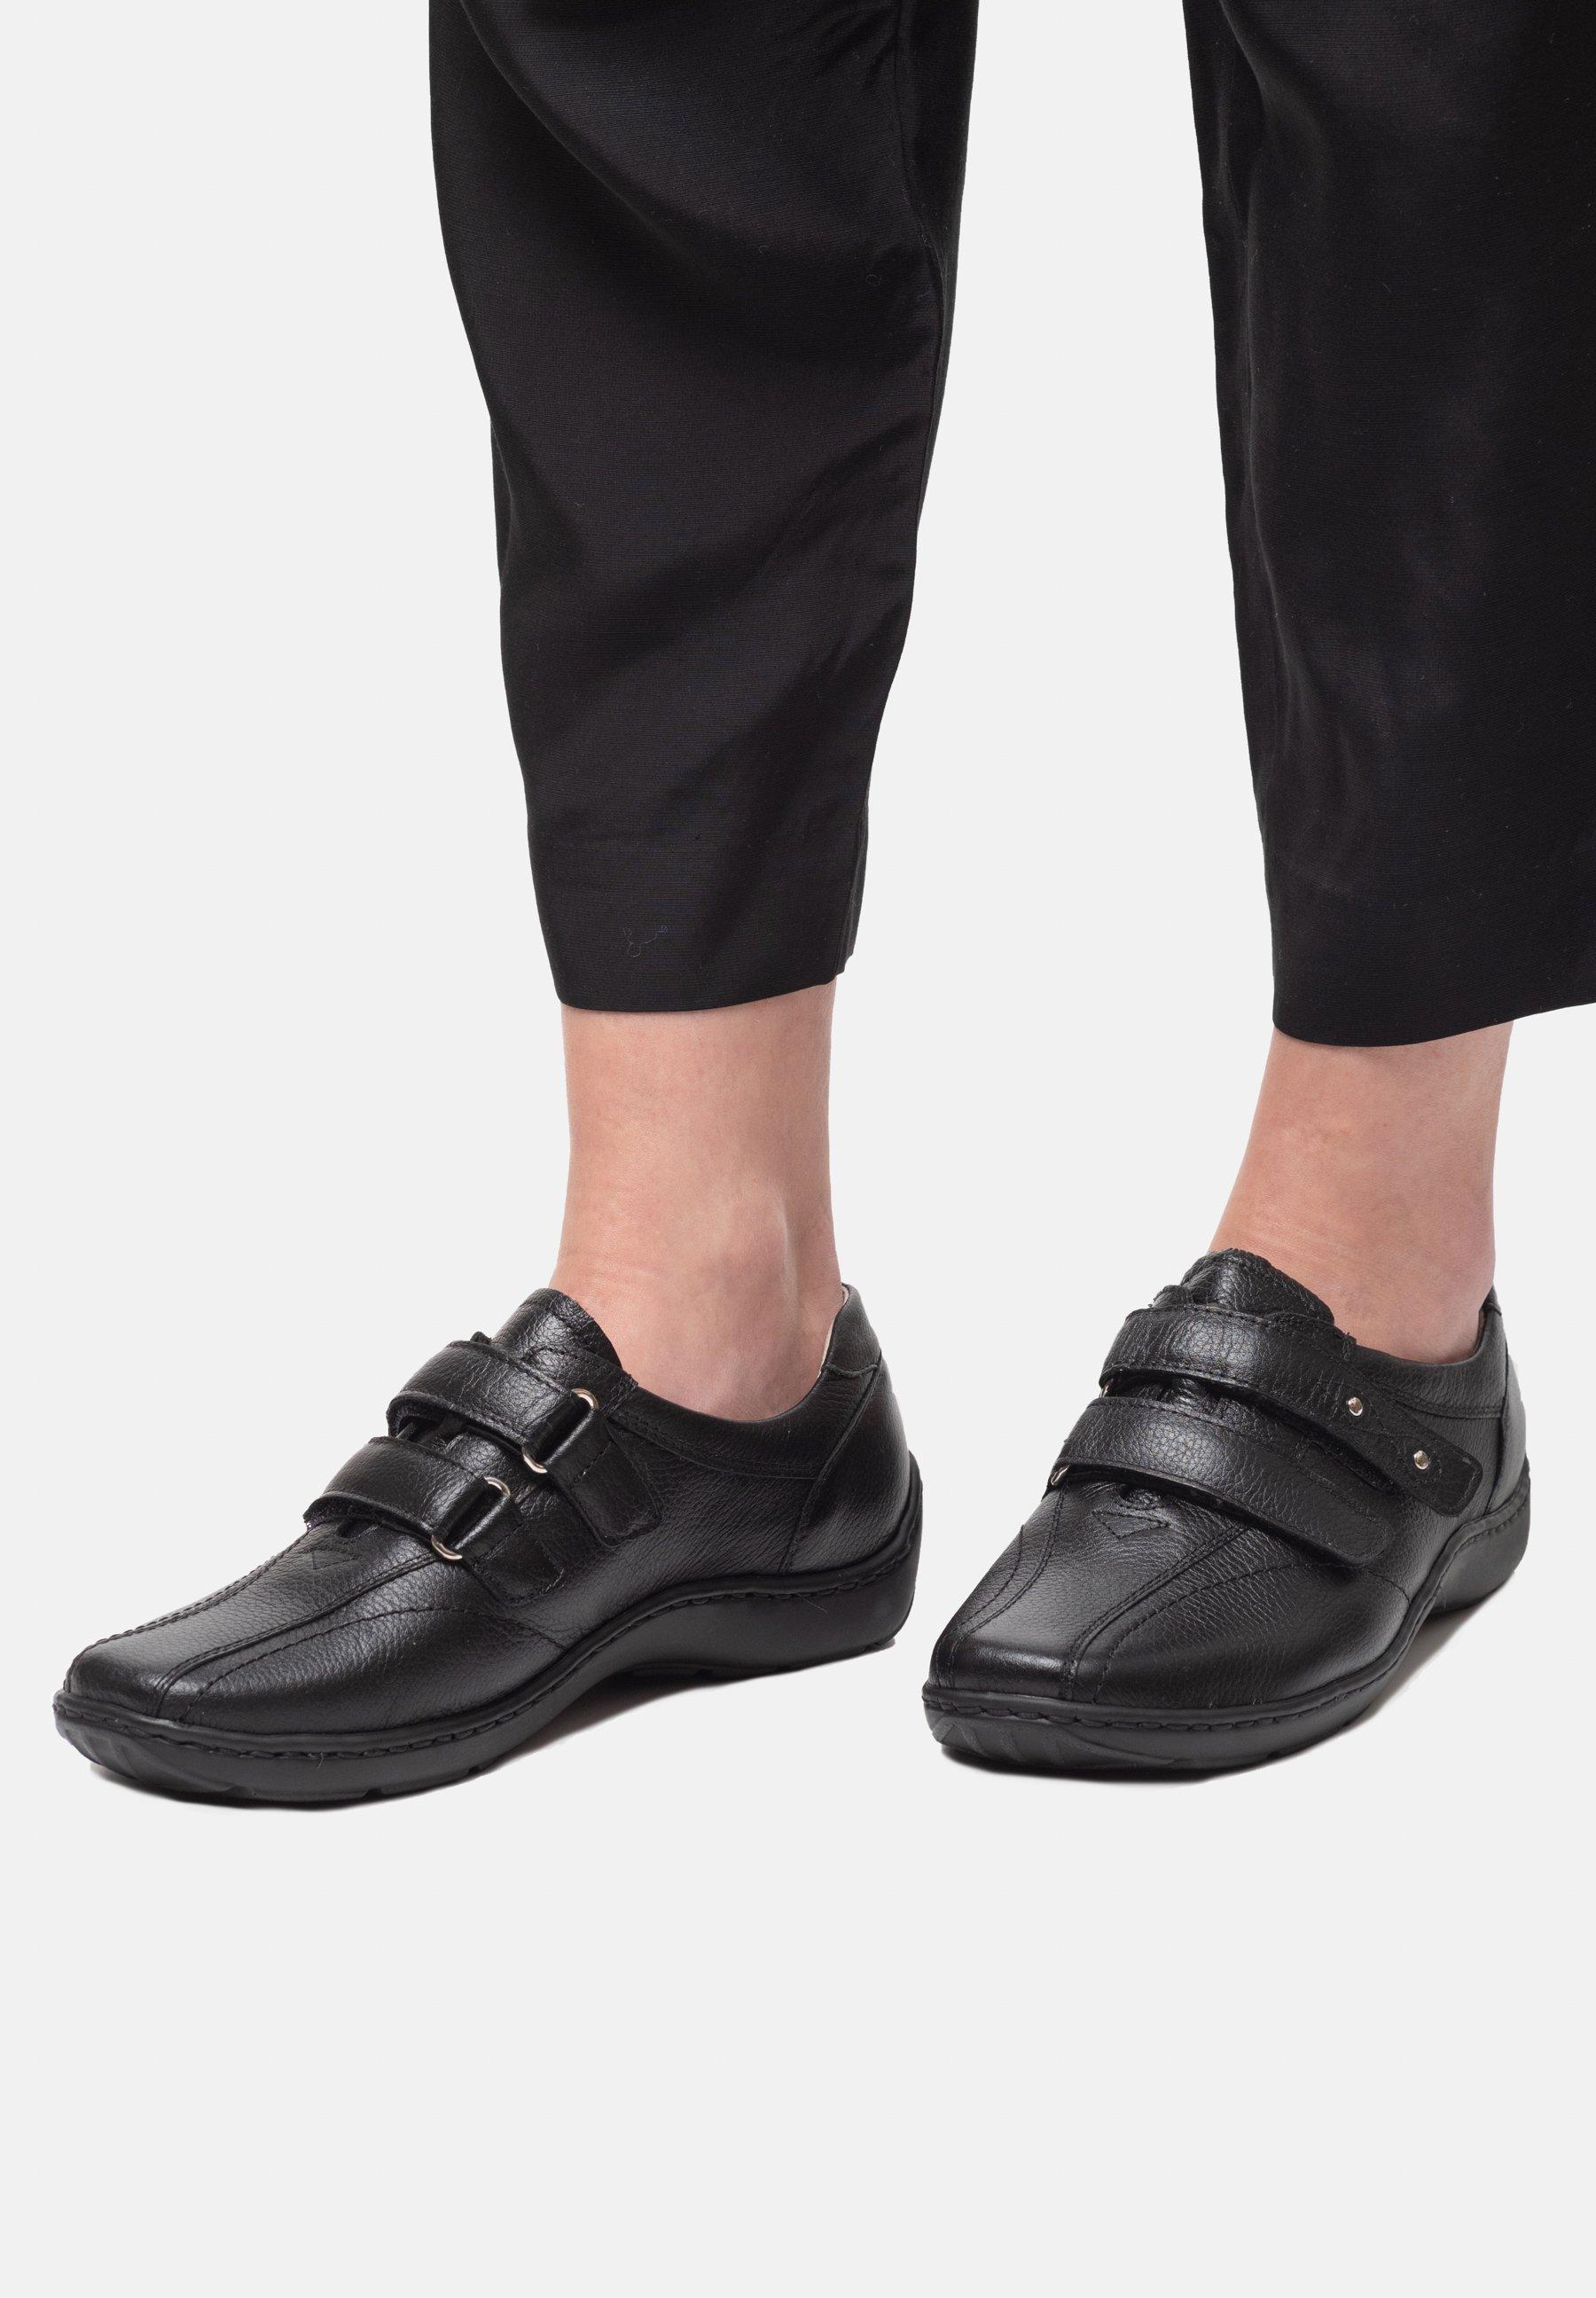 Damen Slipper